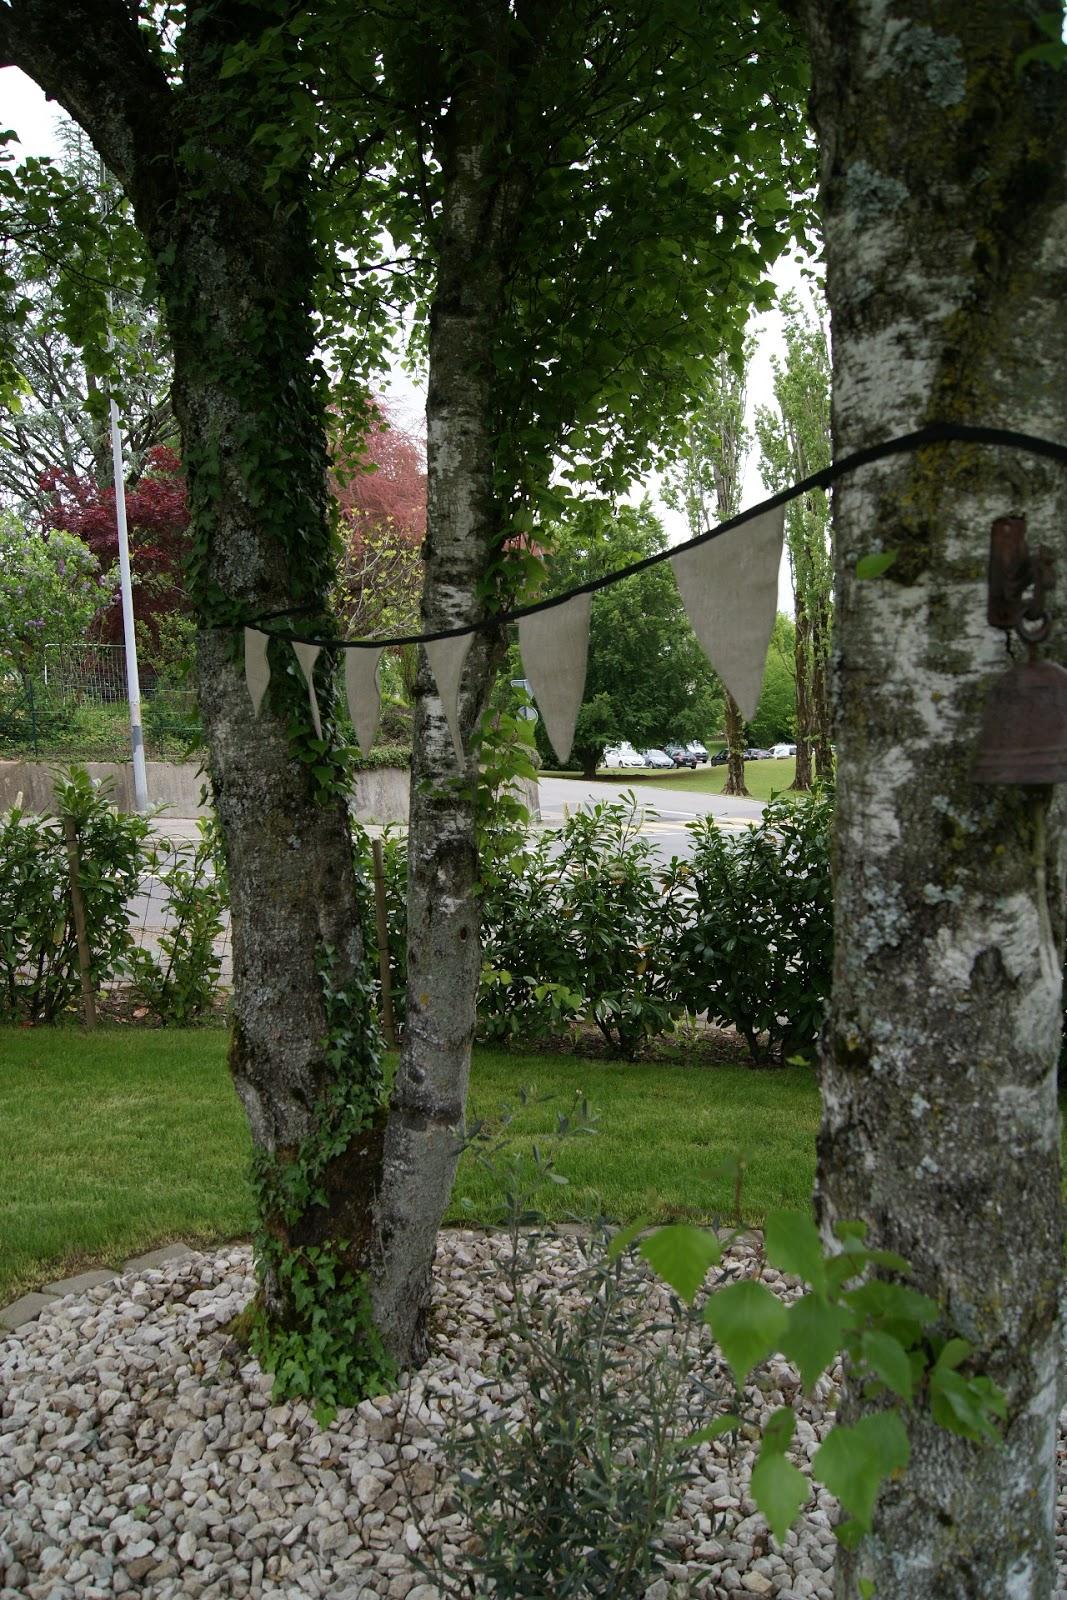 blancdeco une guirlande de fanions dans le jardin. Black Bedroom Furniture Sets. Home Design Ideas